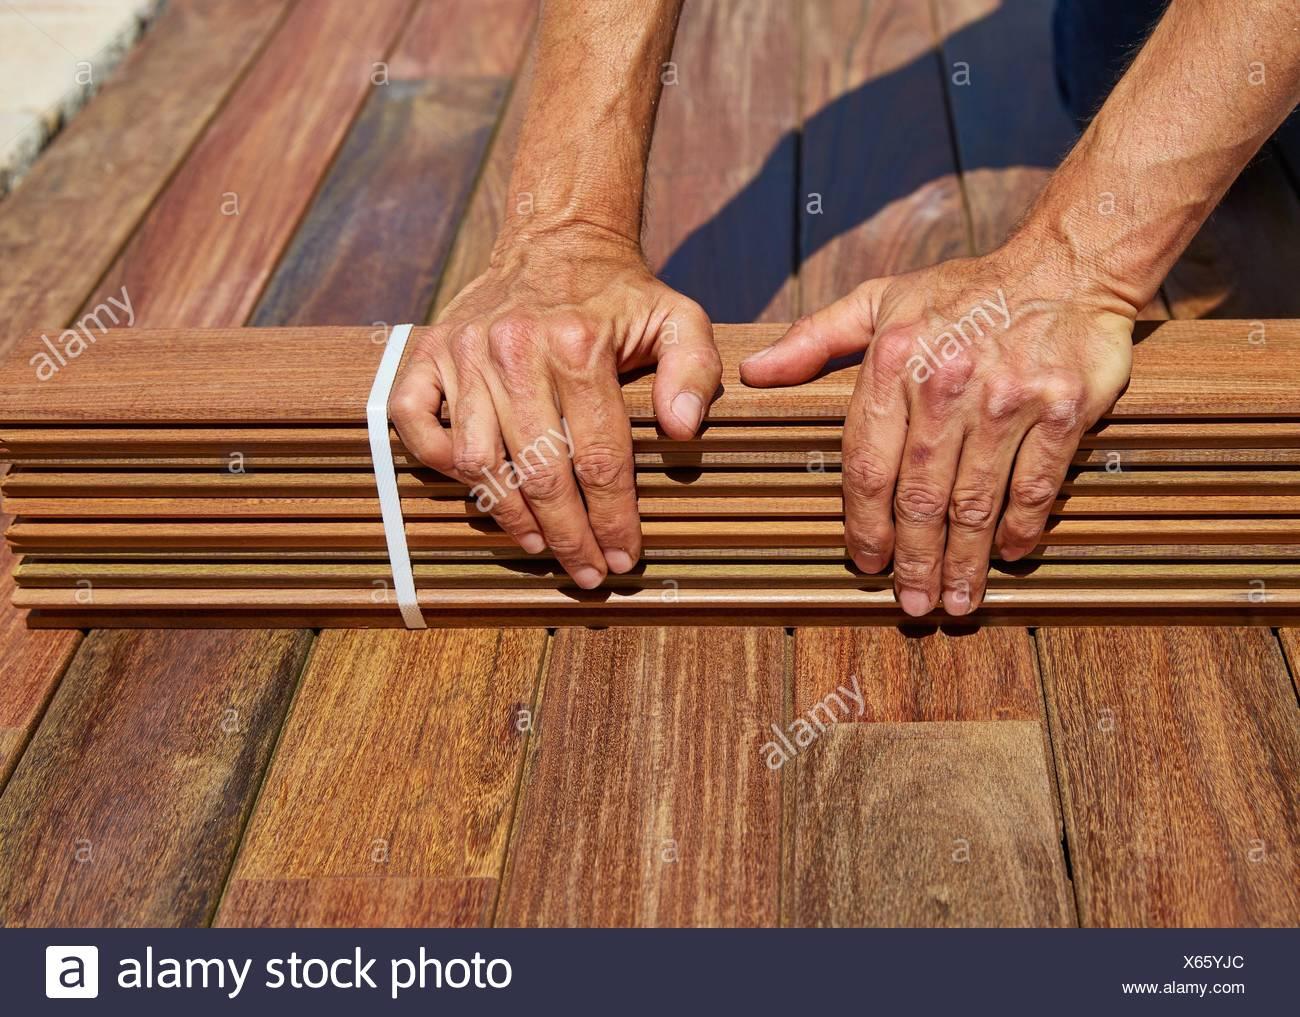 Ou Acheter Bois Ipe l'installation de lame terrasse ipe avec carpenter mains